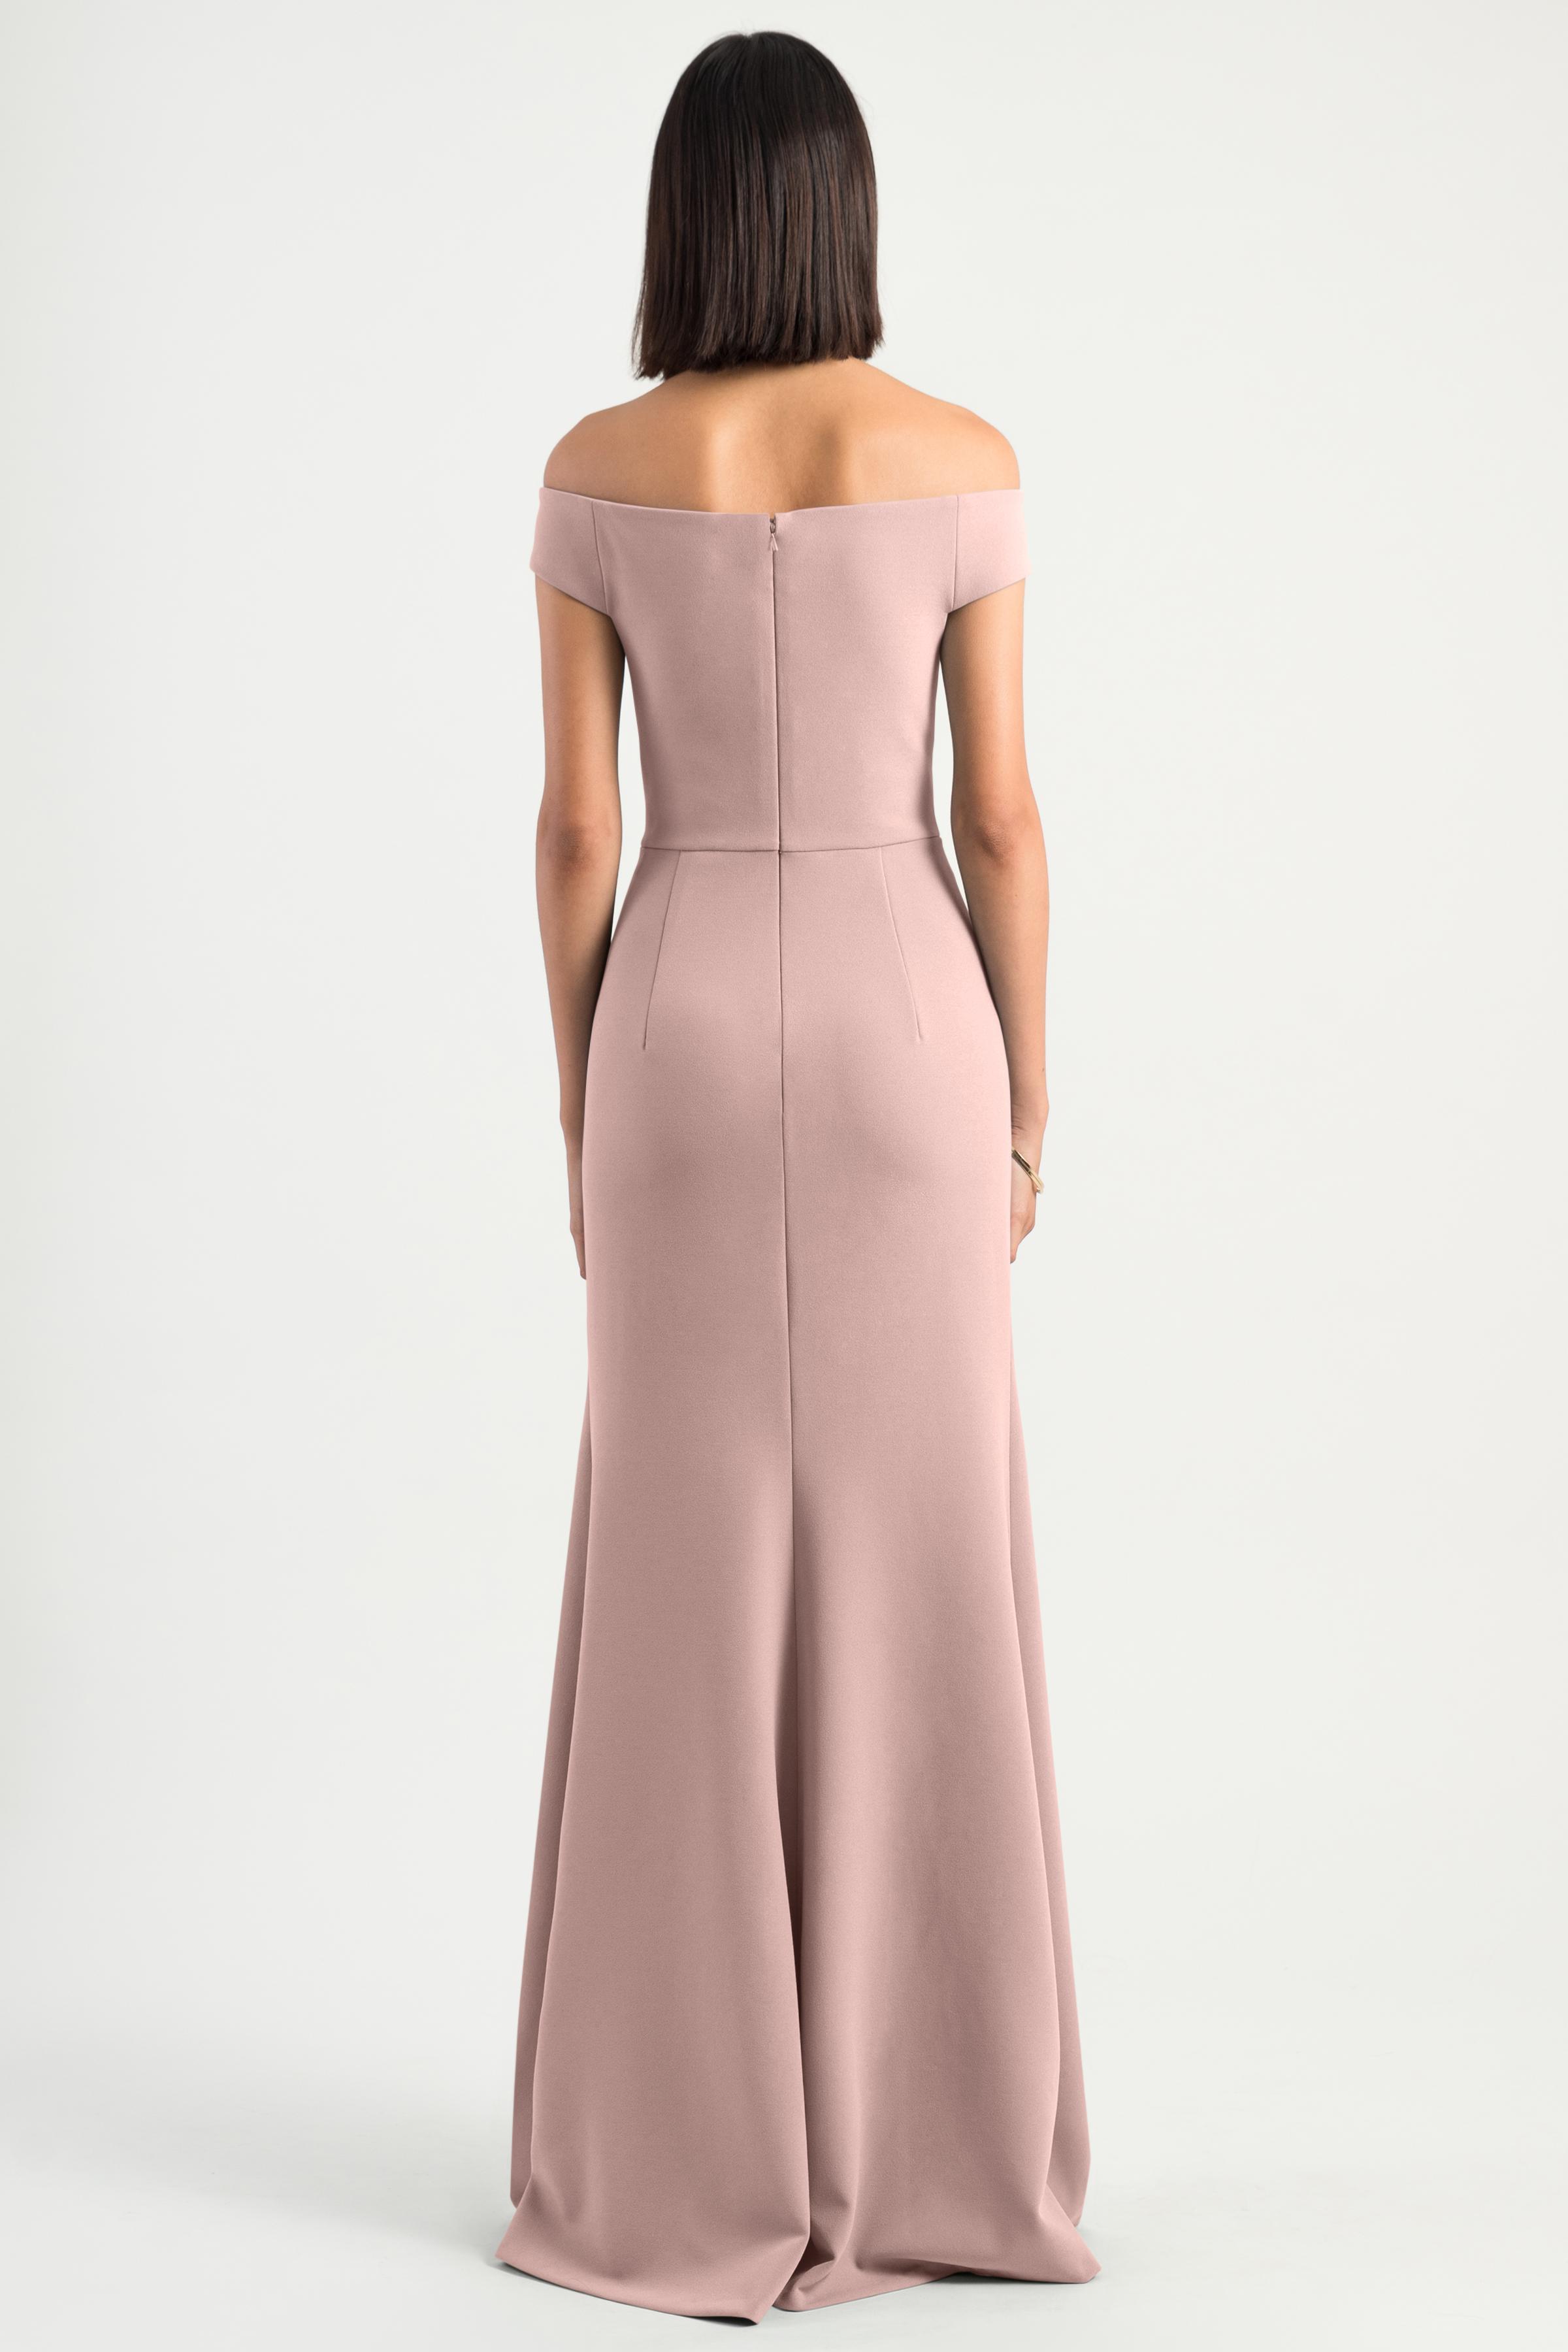 Larson Bridesmaids Dress by Jenny Yoo - Whipped Apricot